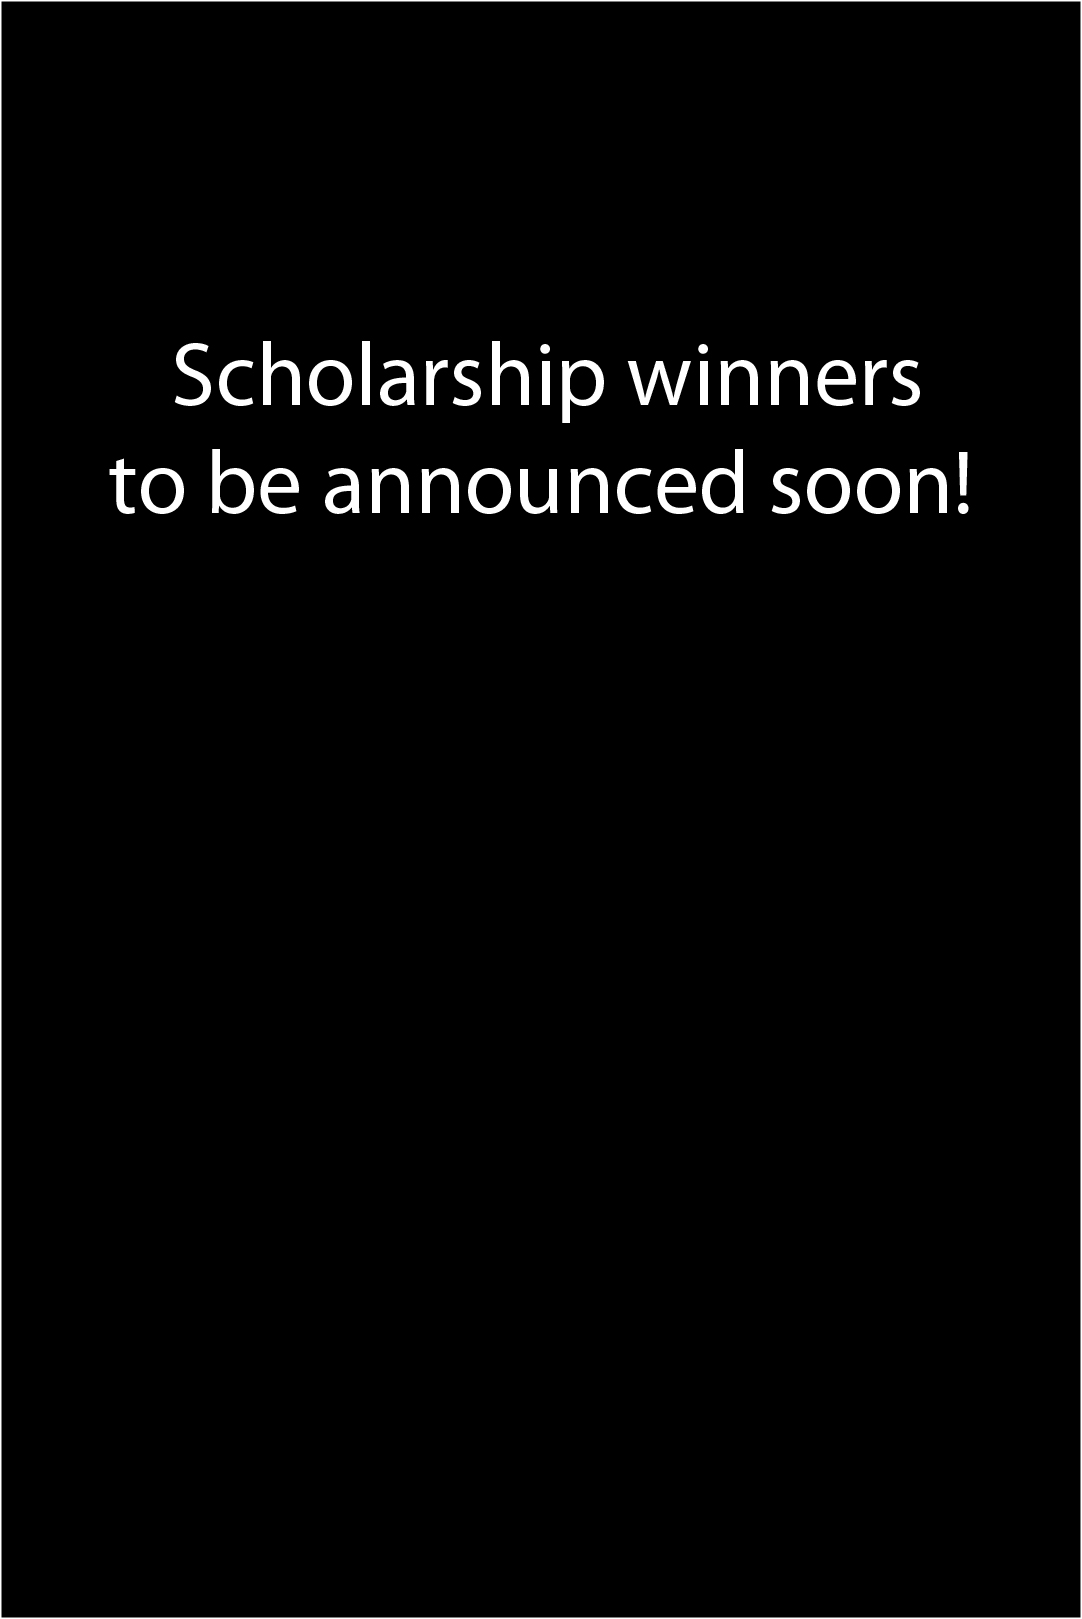 Scholarship announce last